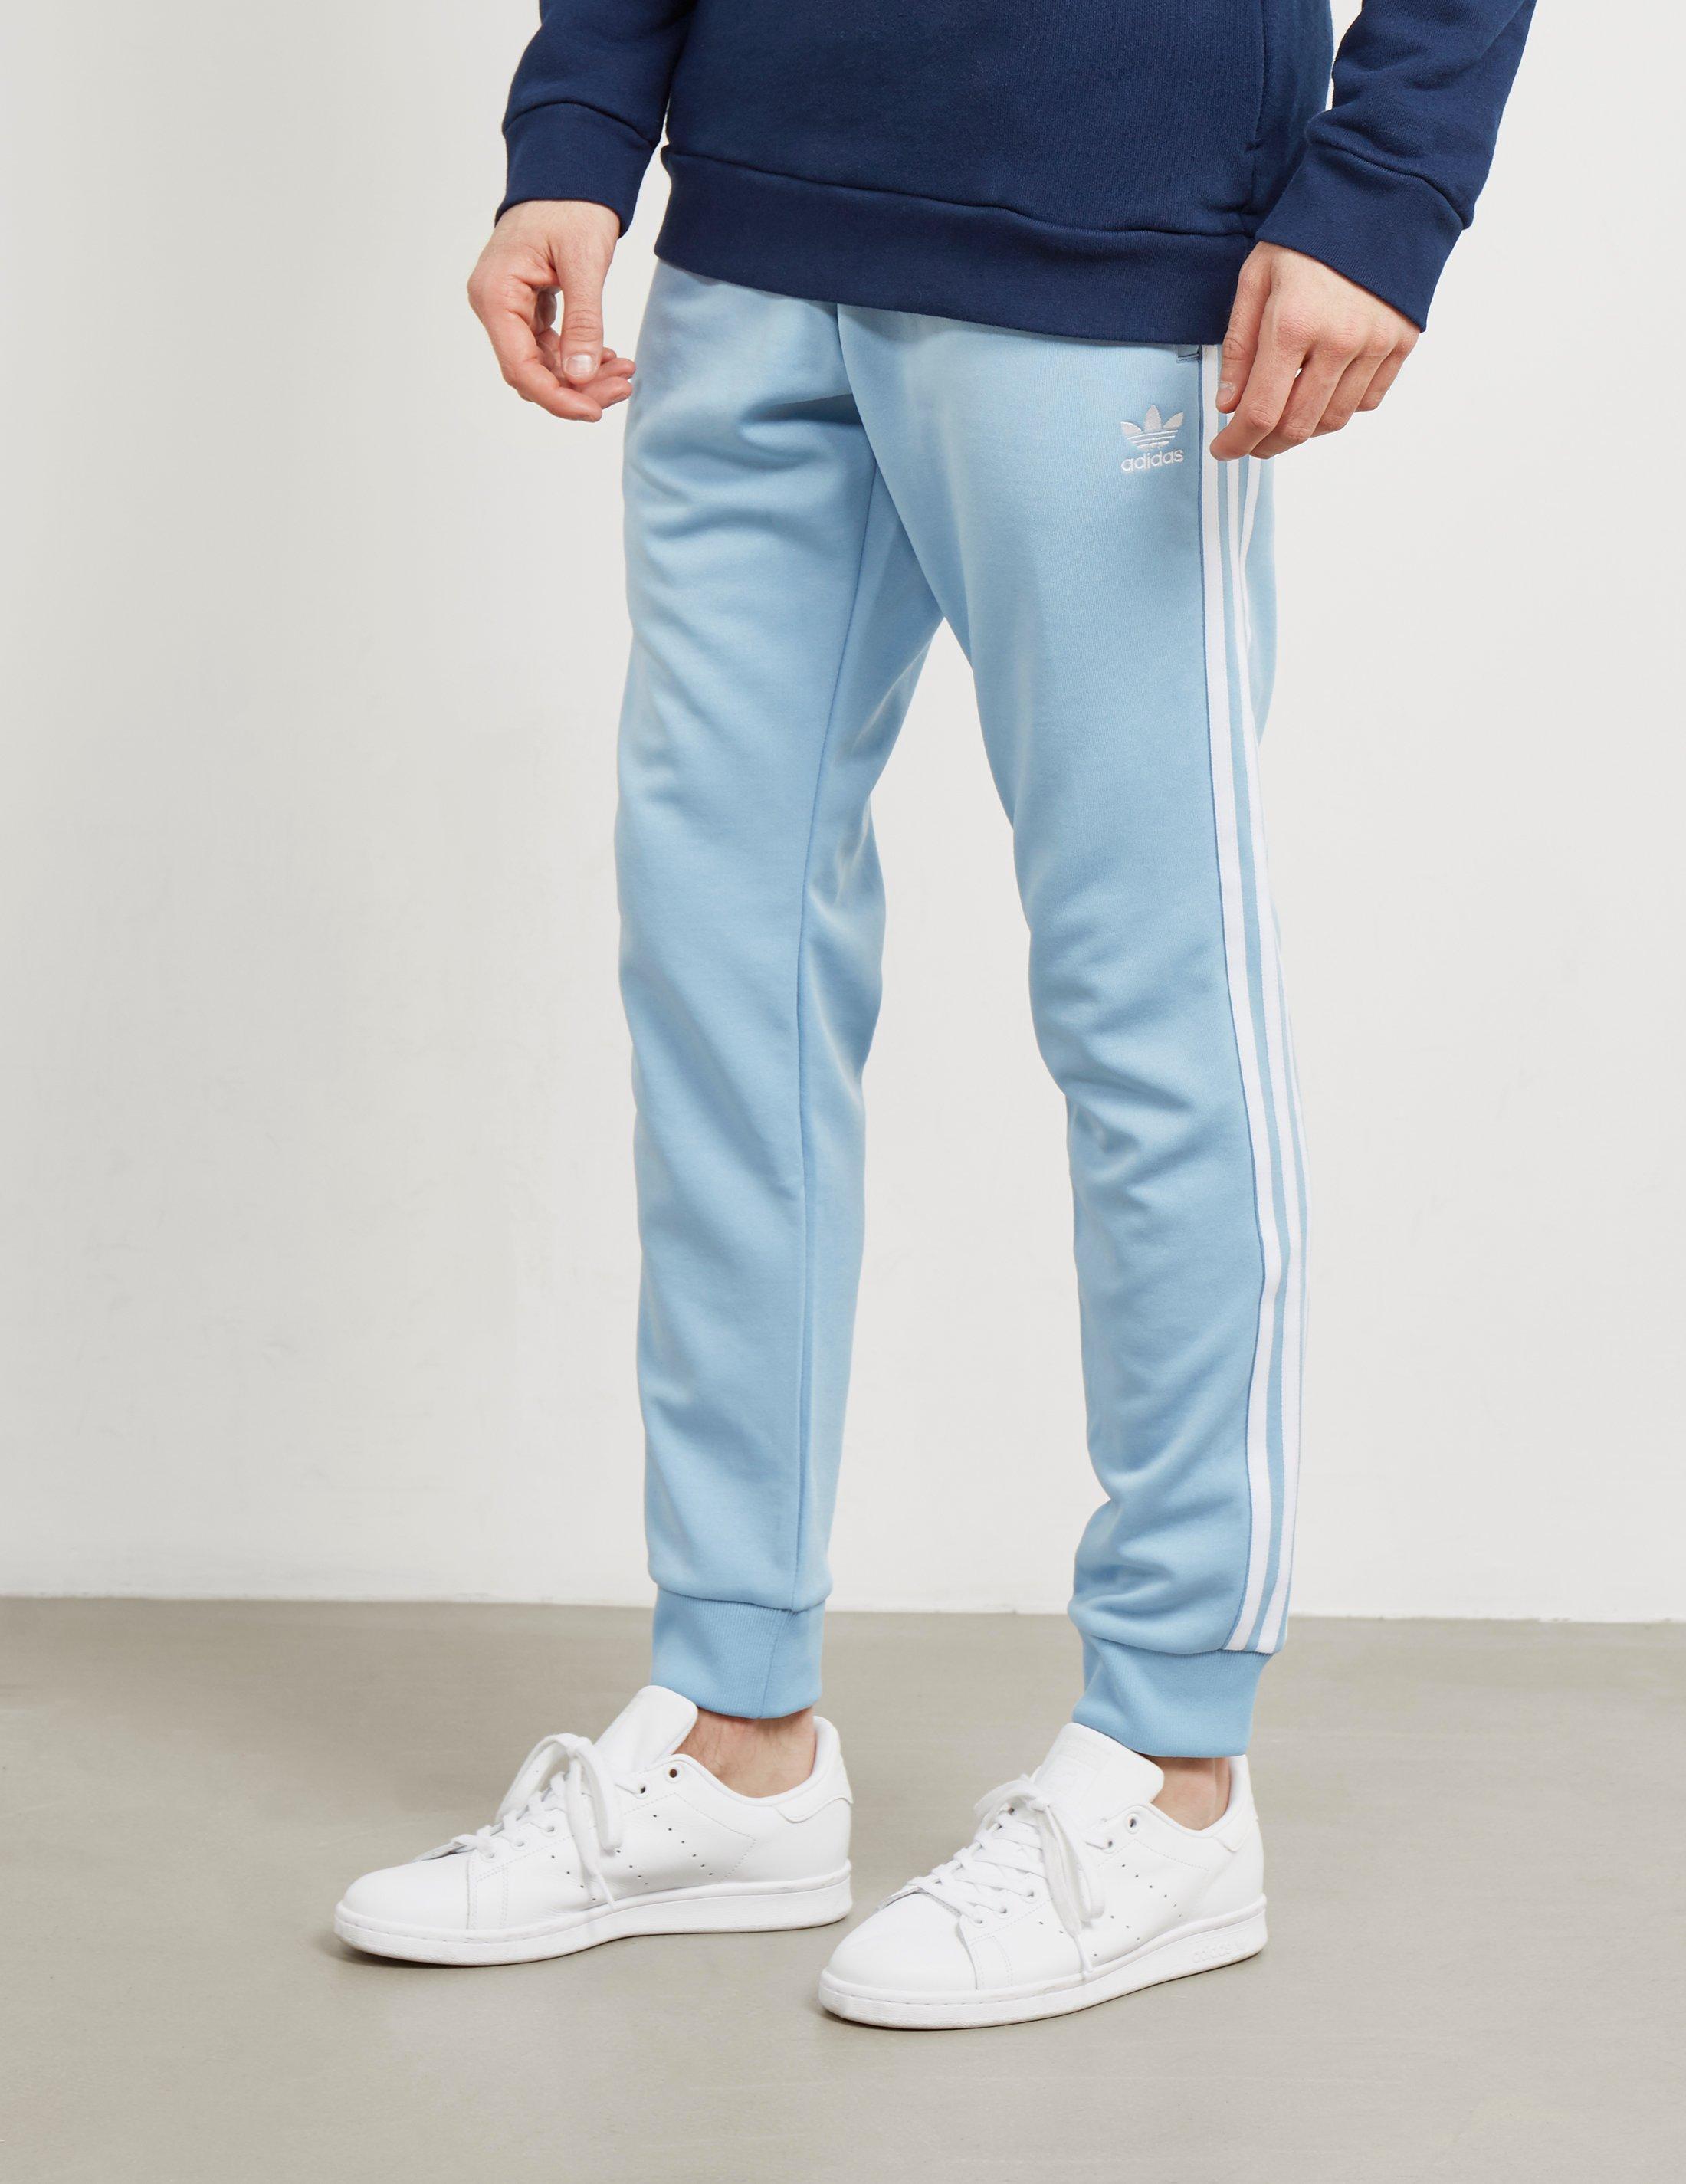 adidas Originals Mens Superstar Track Pants